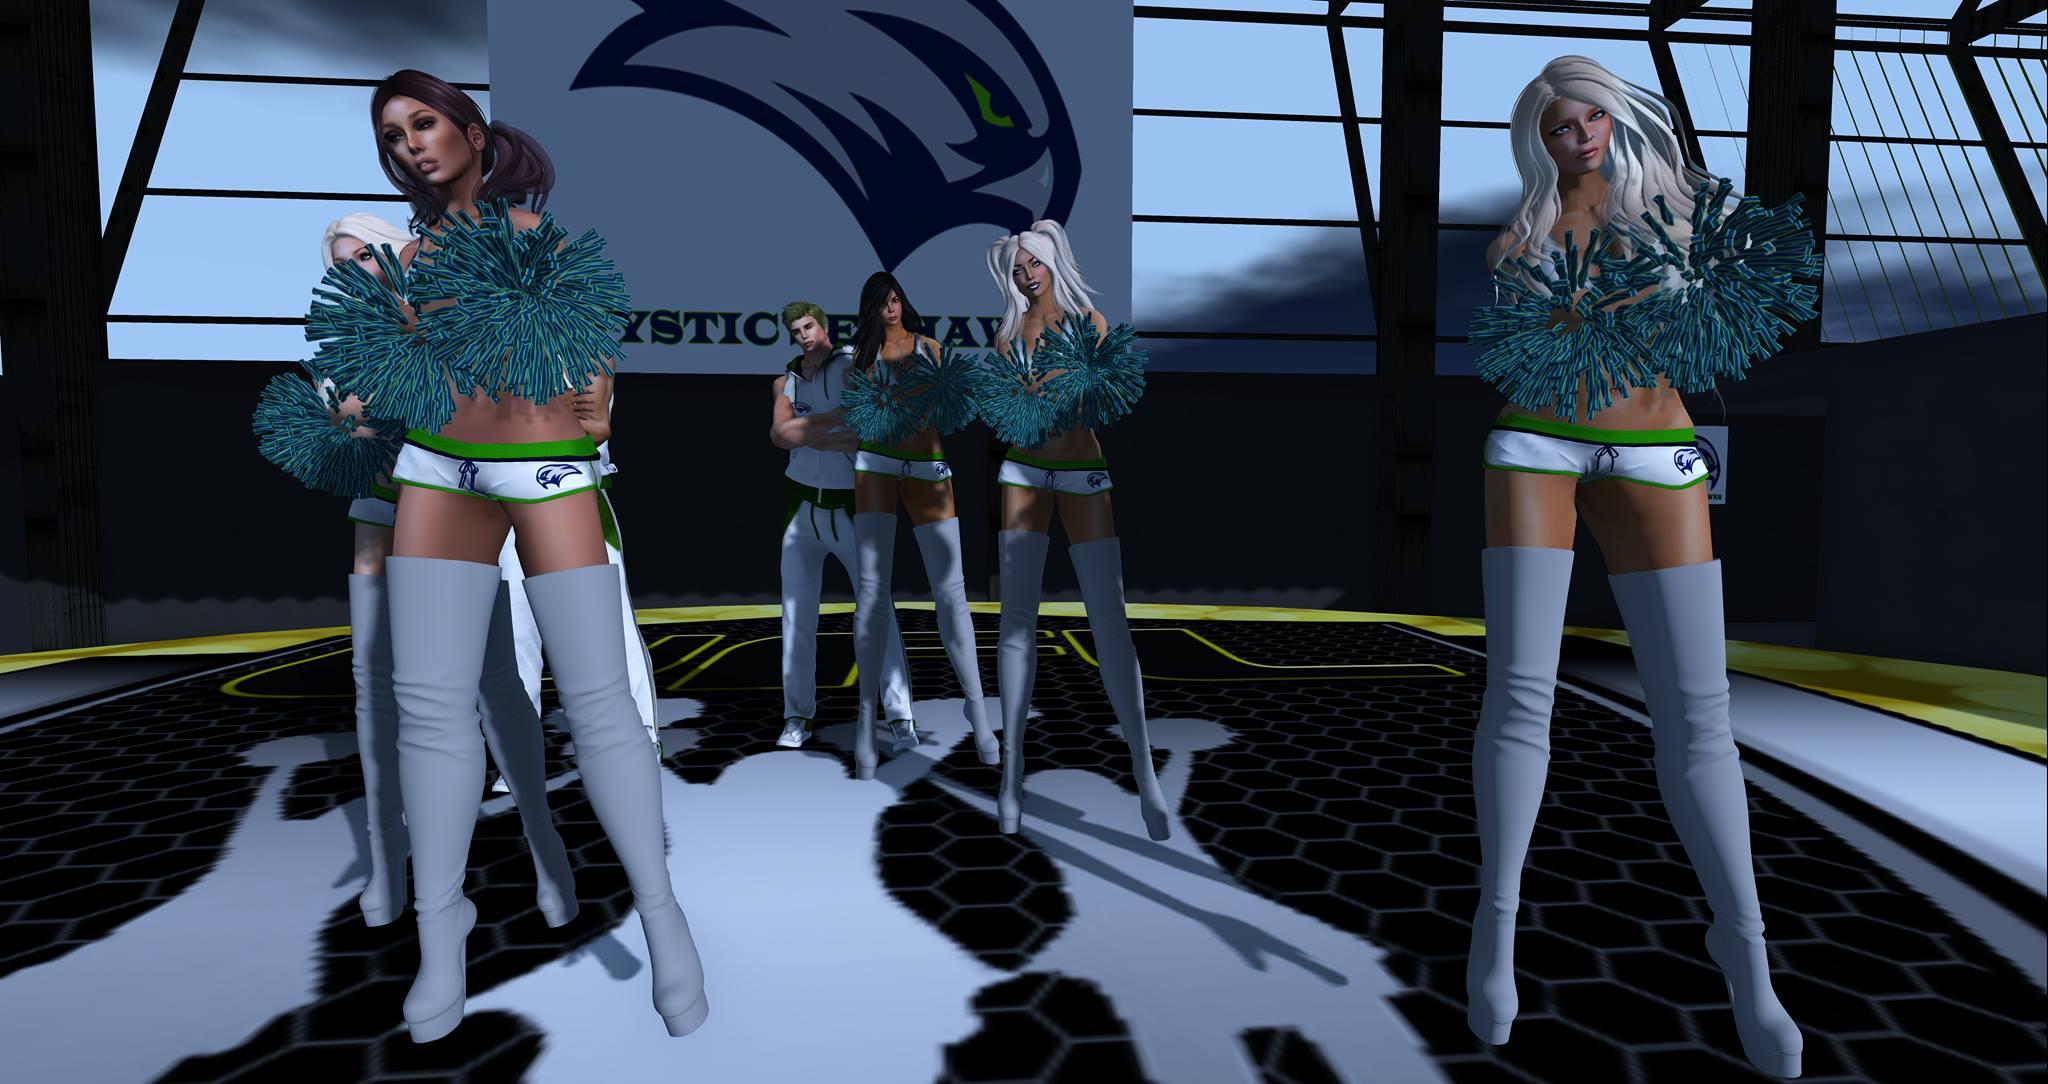 Mystic Seahawks Cheerleaders